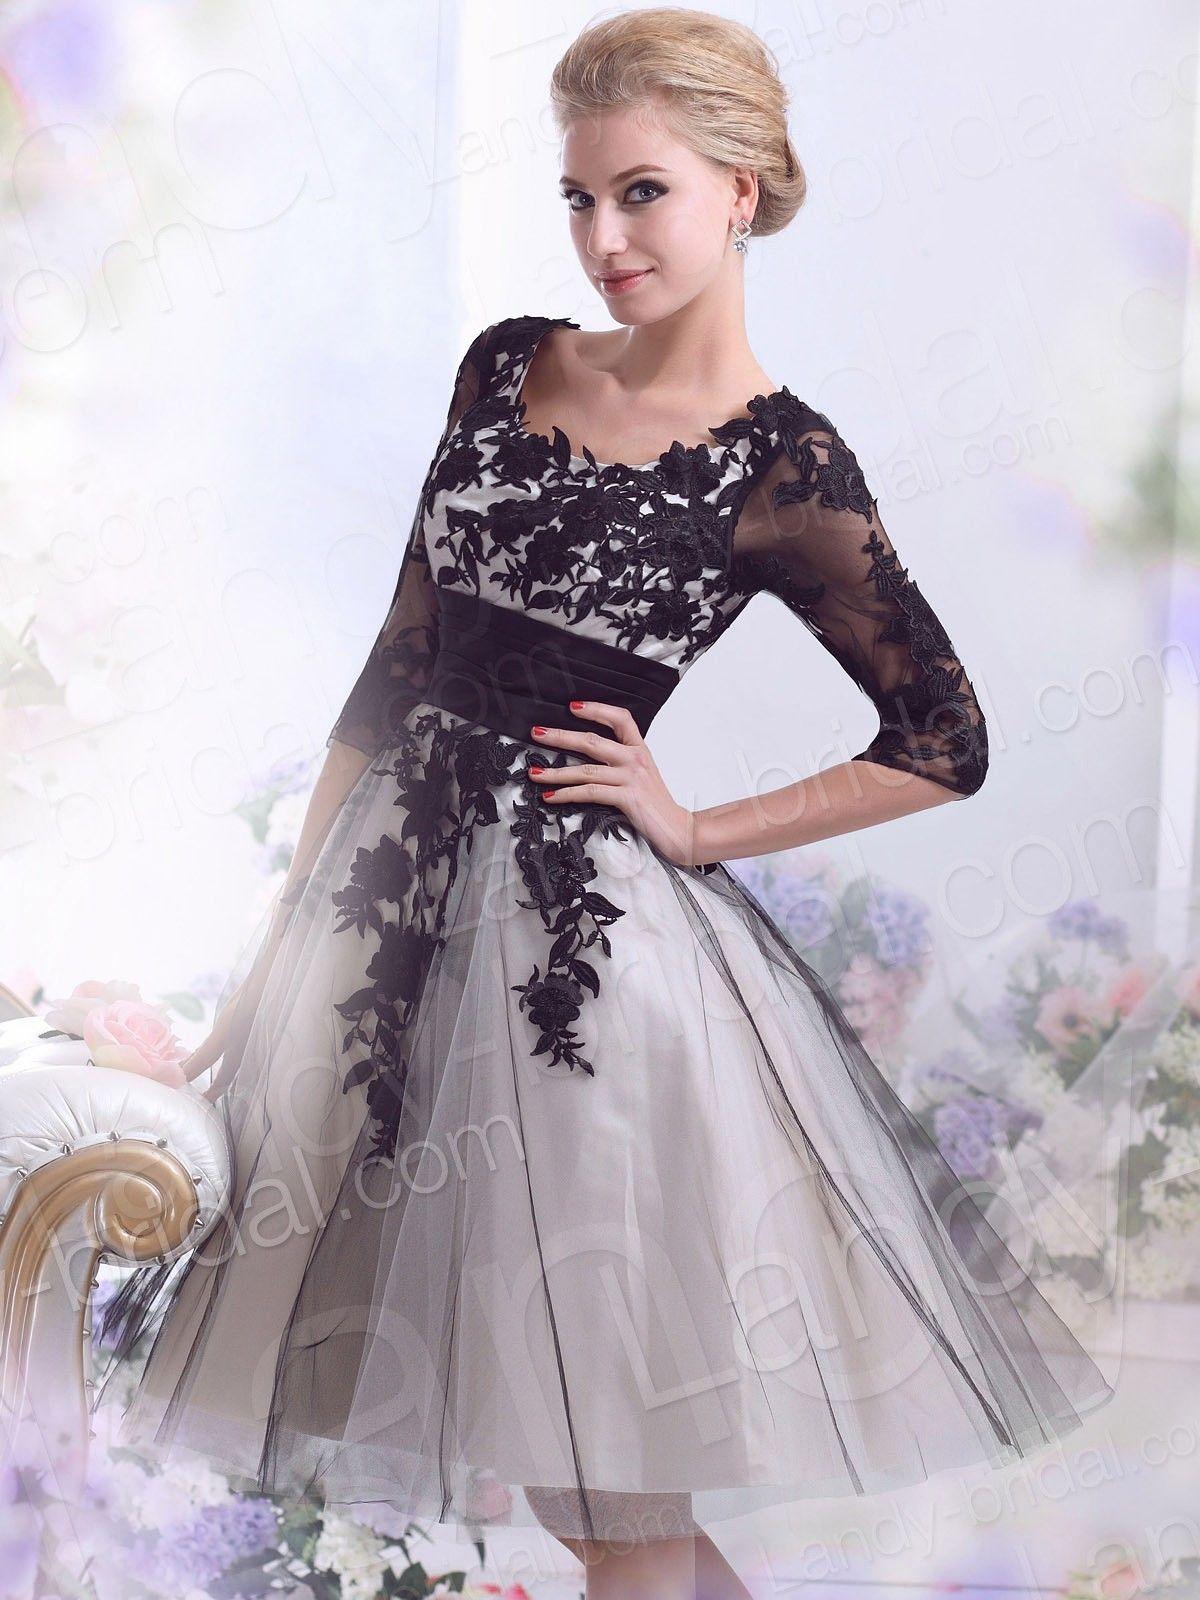 alinesquareshorttulleblackweddingdress Black